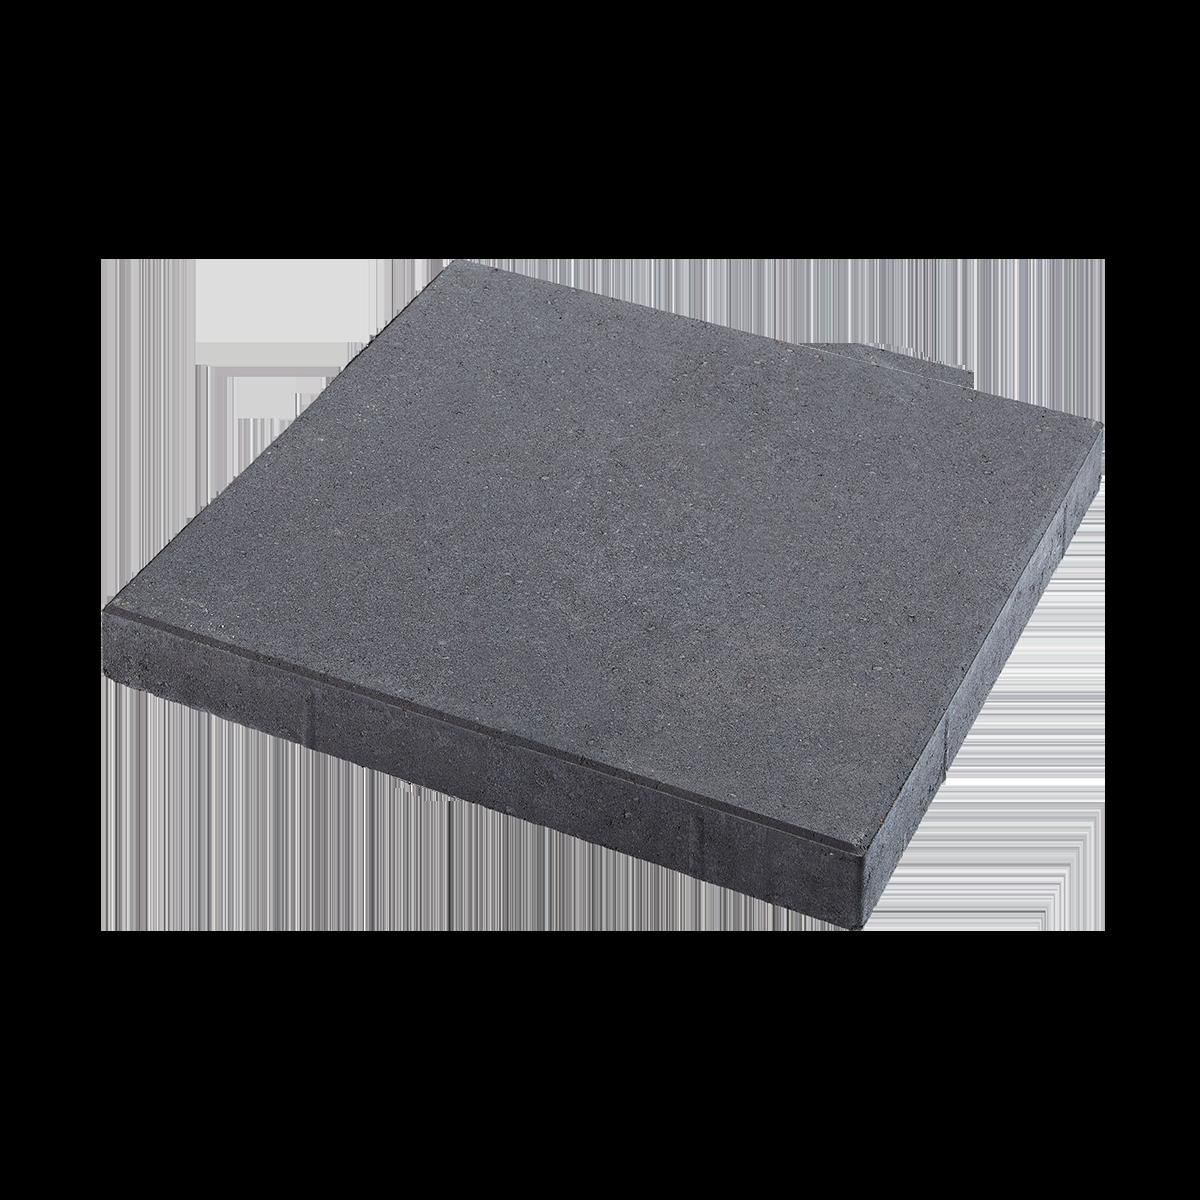 Fliser 60x60x6 cm Sort/Antracit